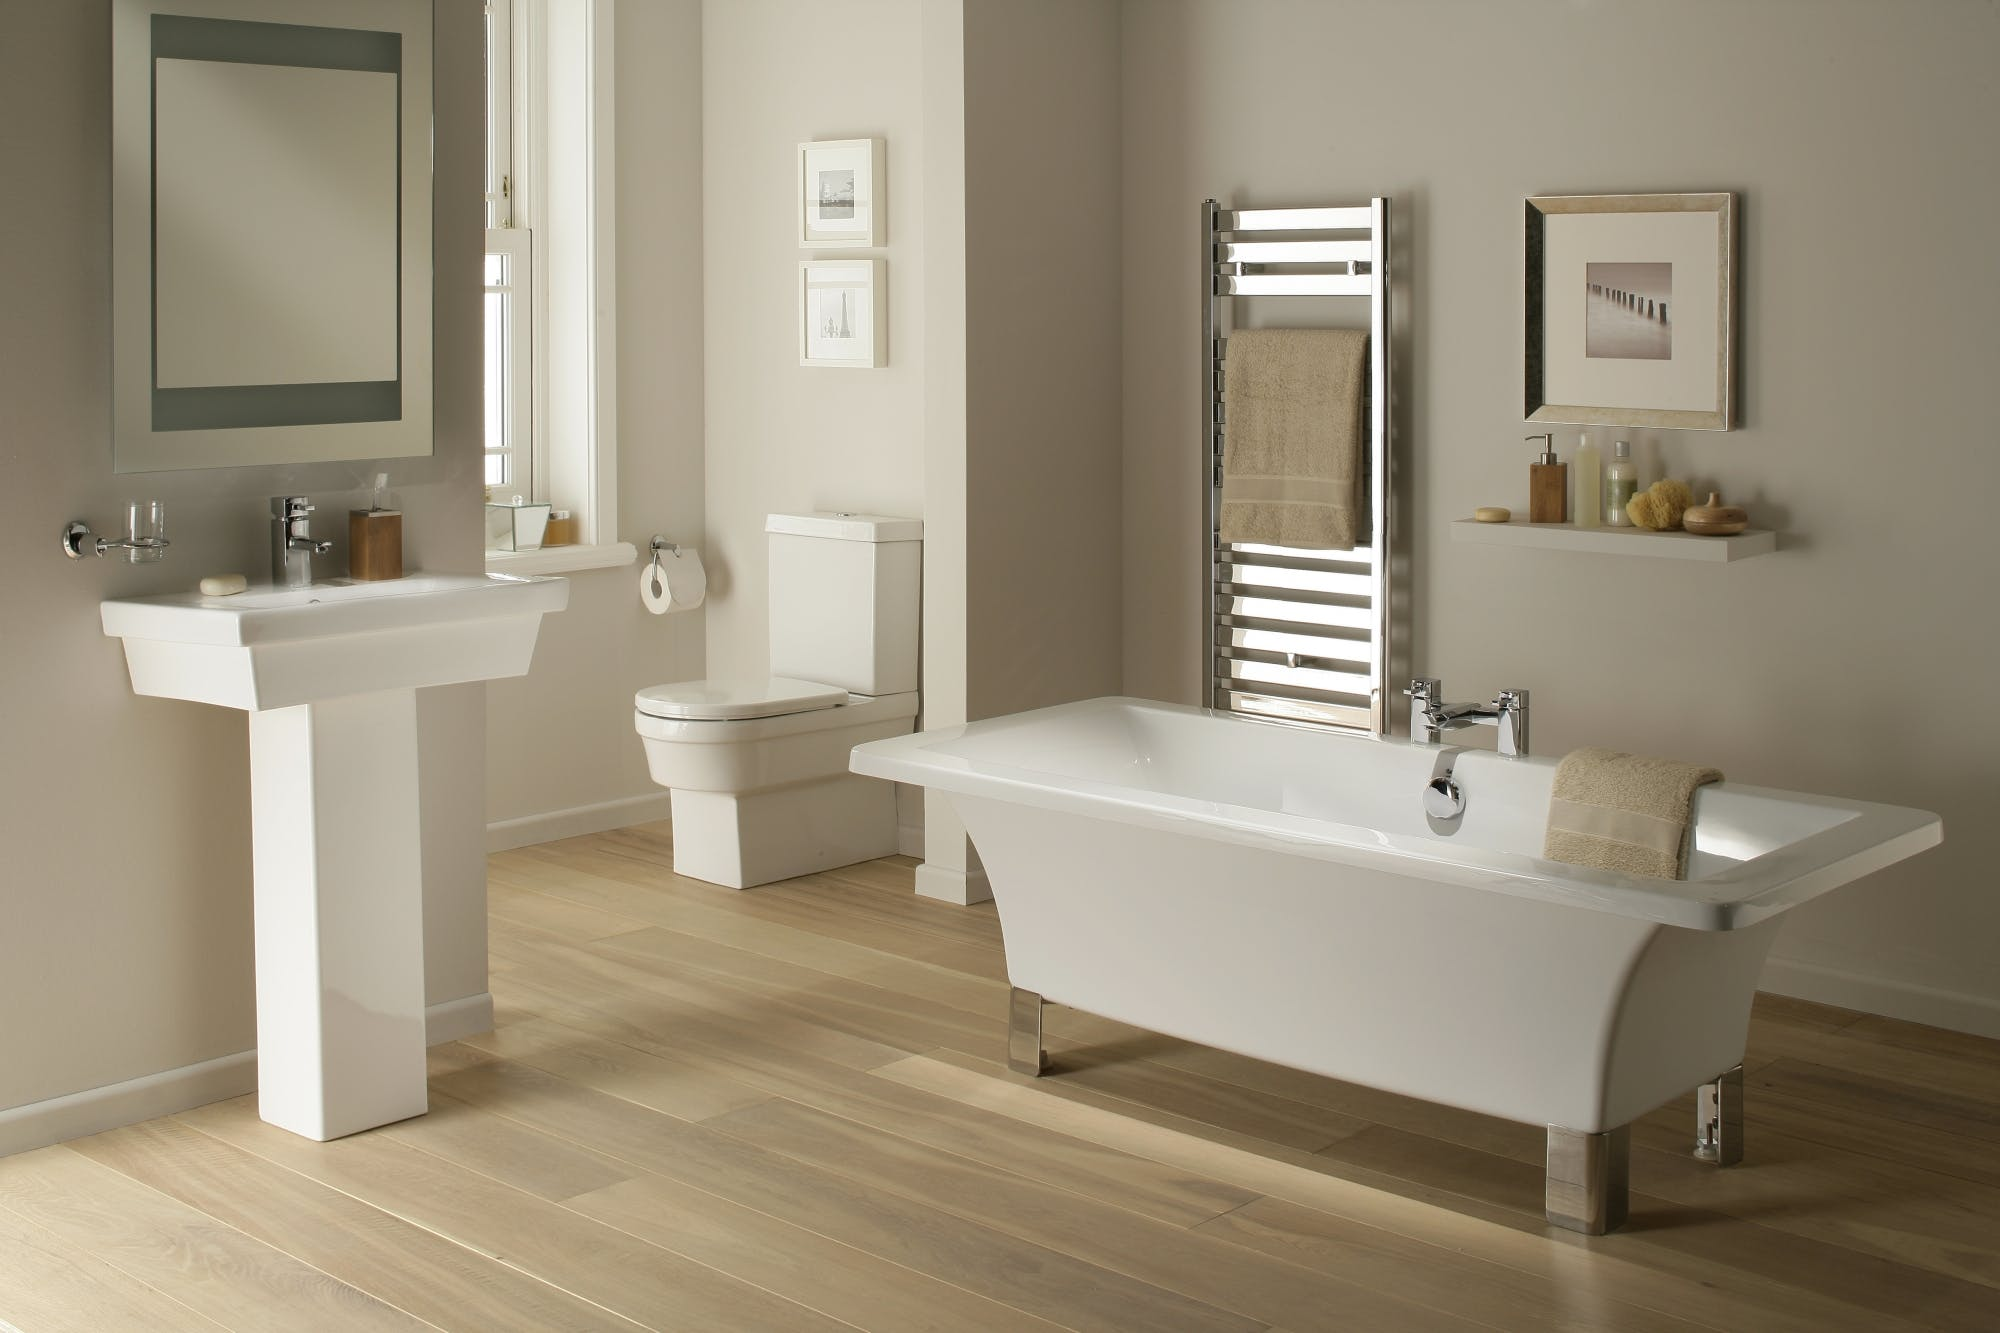 Bathrooms En Suite Meaning: Internal Improvements, Surveyed & Built By More Build